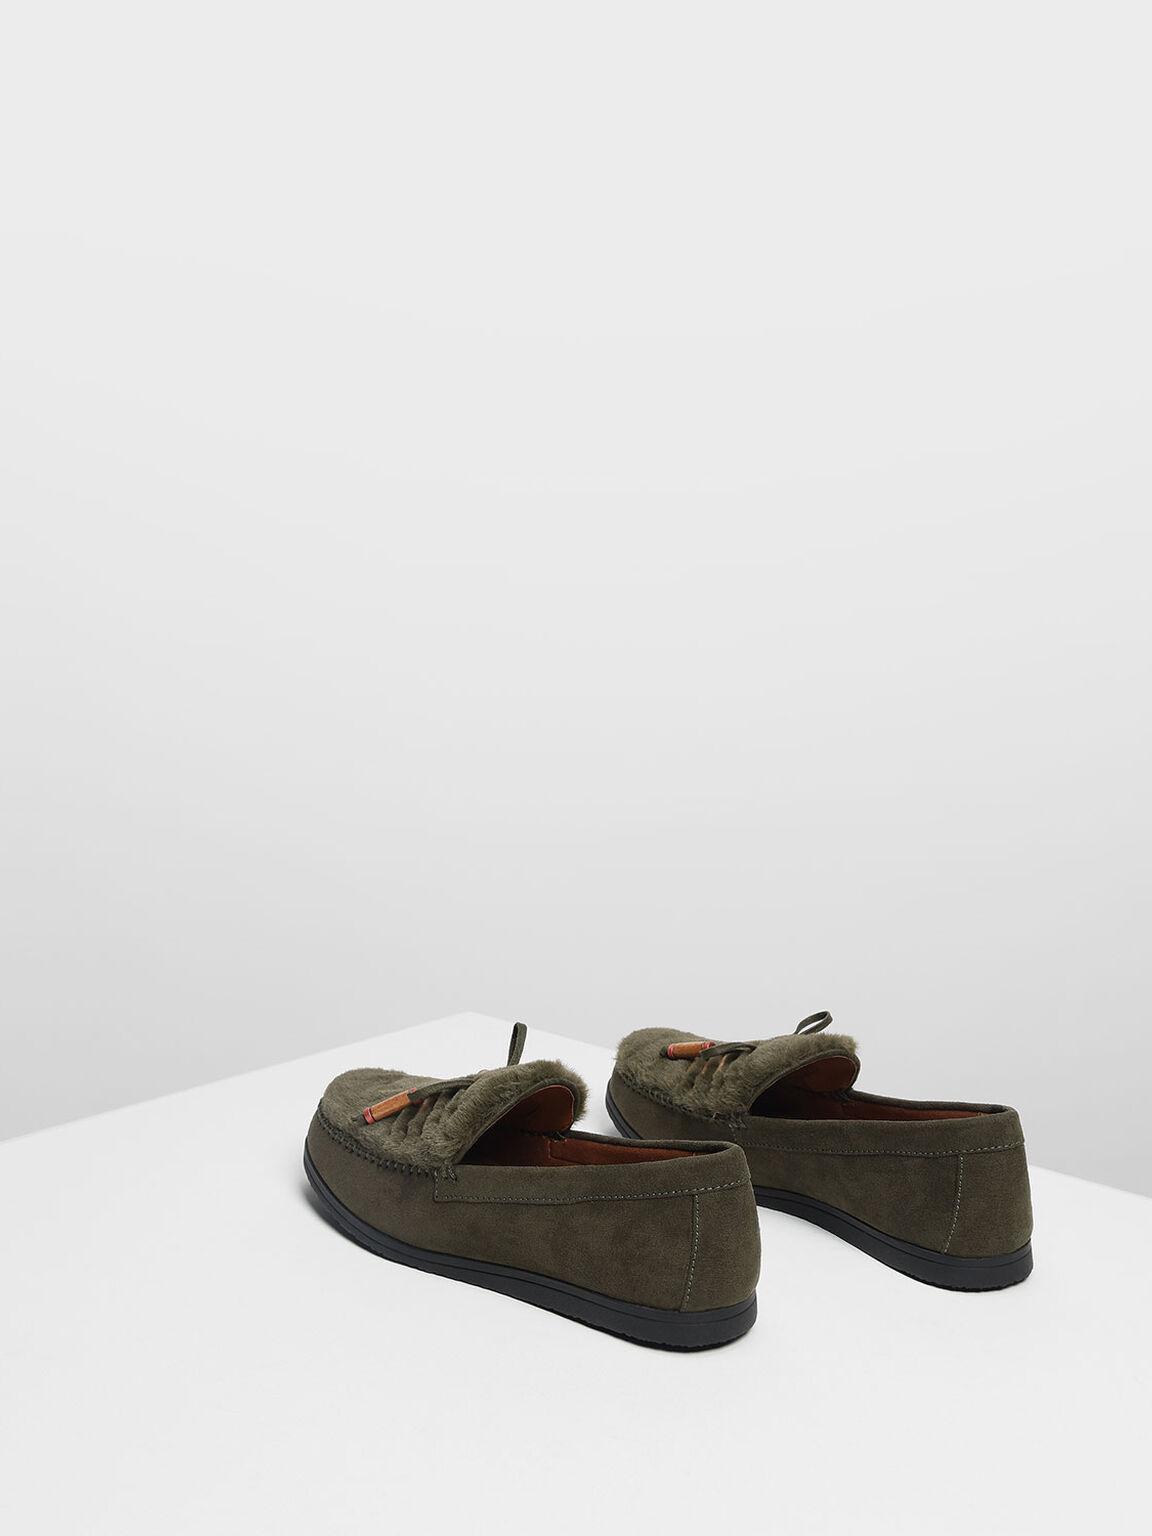 毛毛莫卡辛鞋, 橄欖色, hi-res